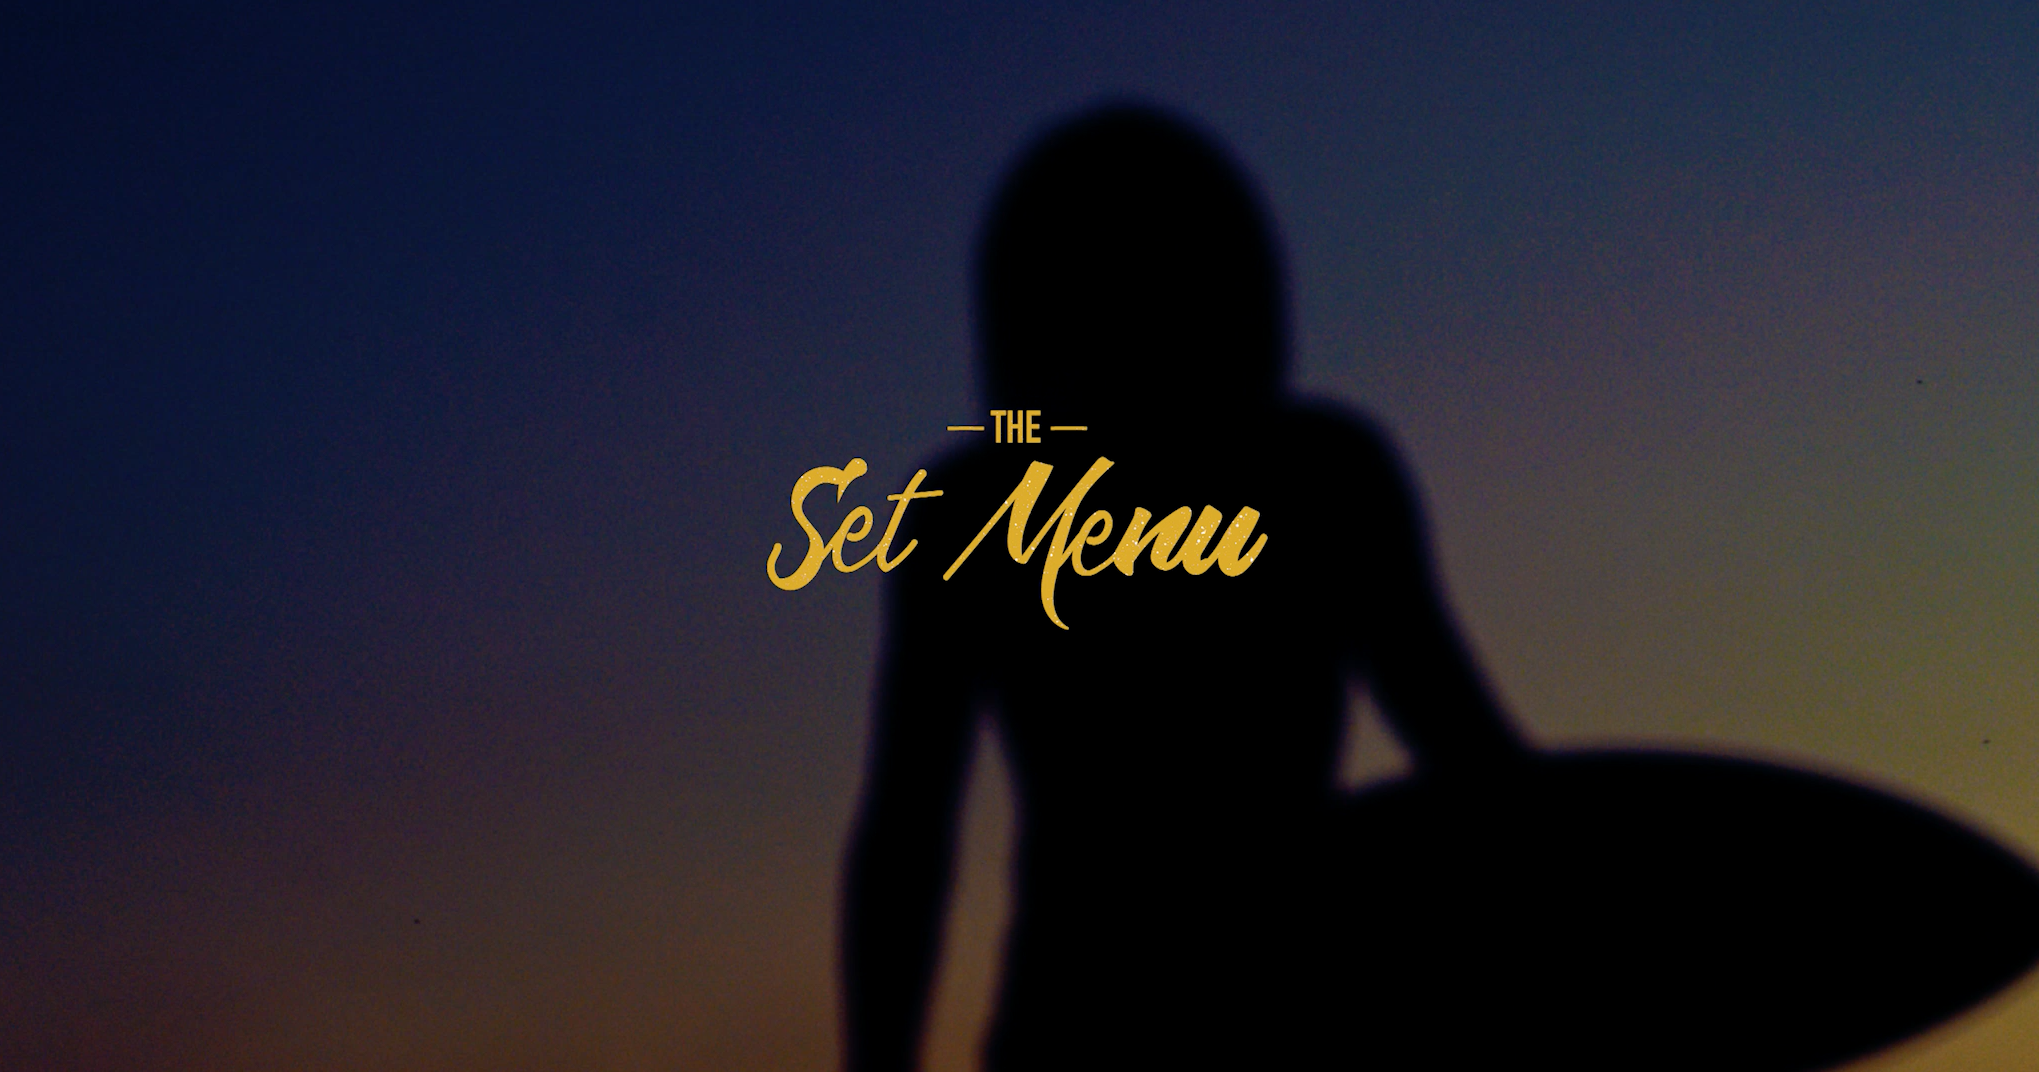 THE SET MENU - A FILM BY DARCY WARD